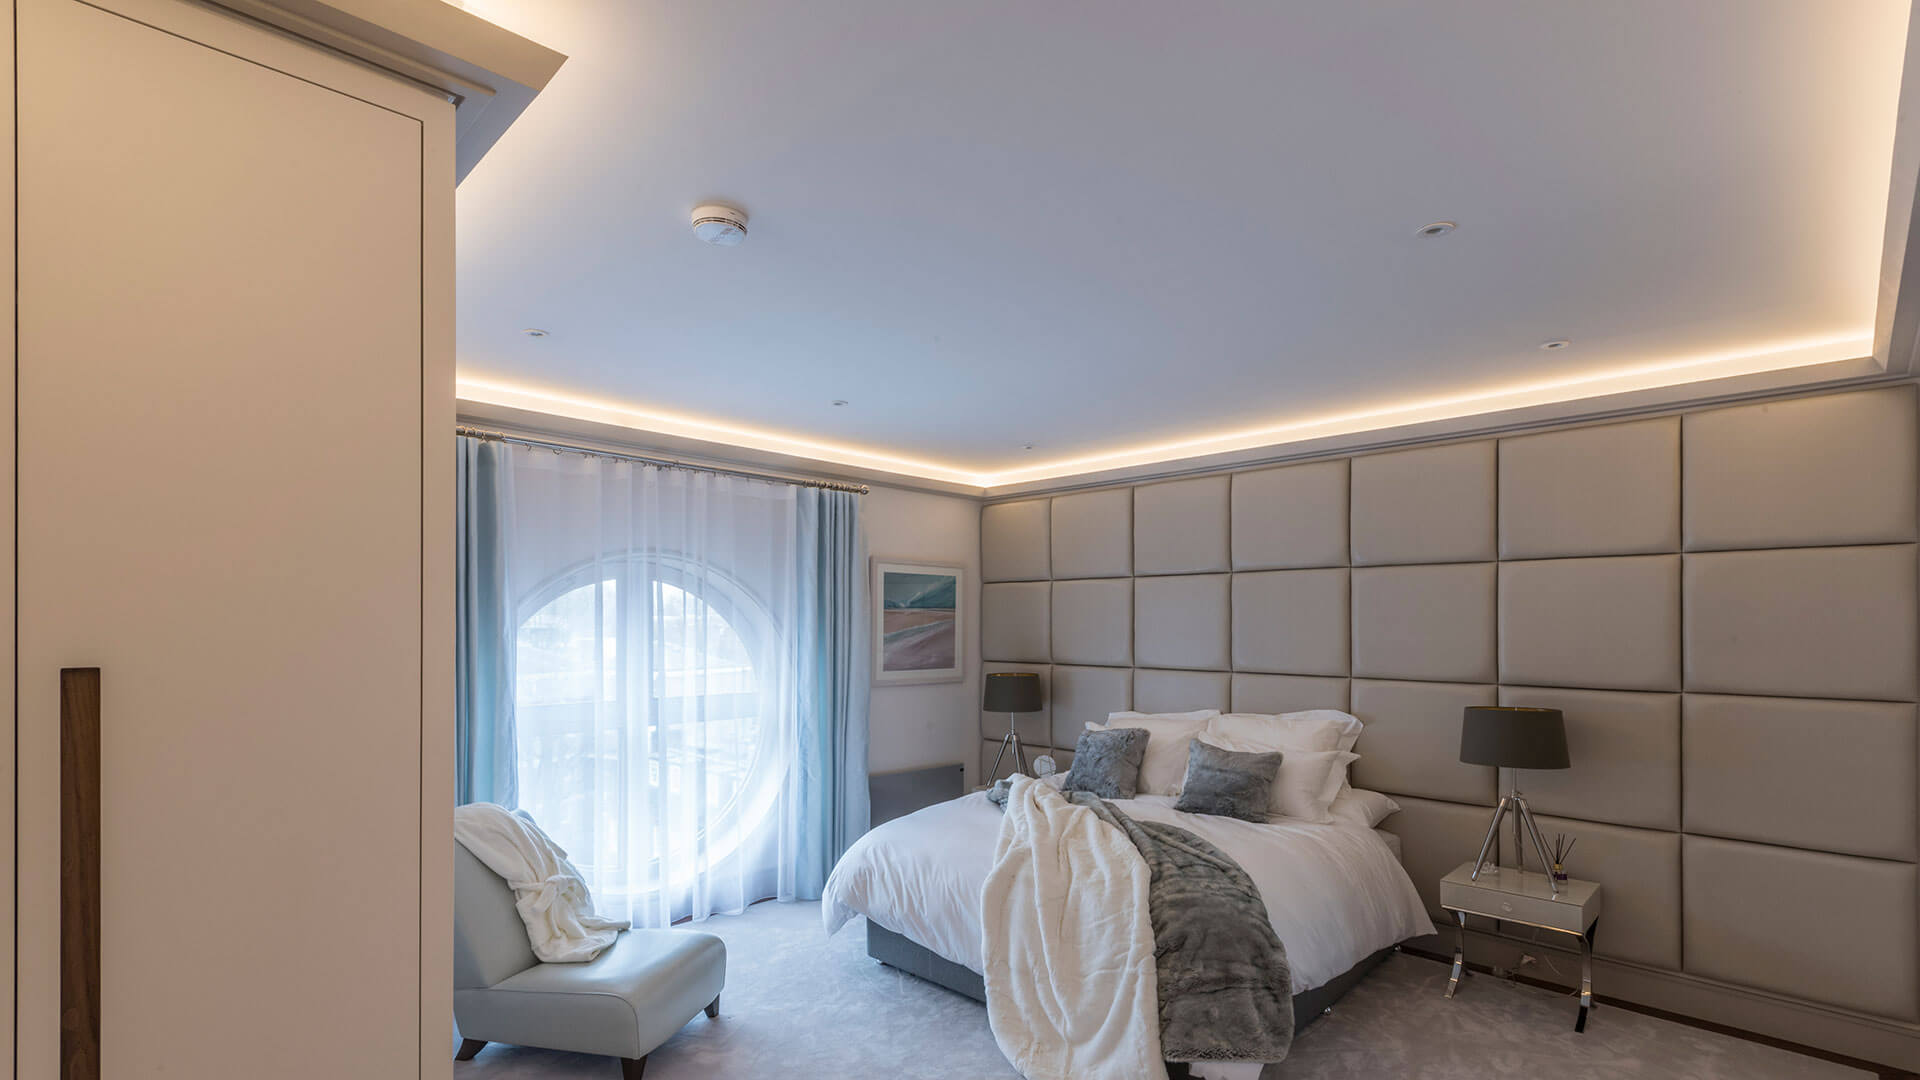 Luxury Notting Hill apartment refurbishment